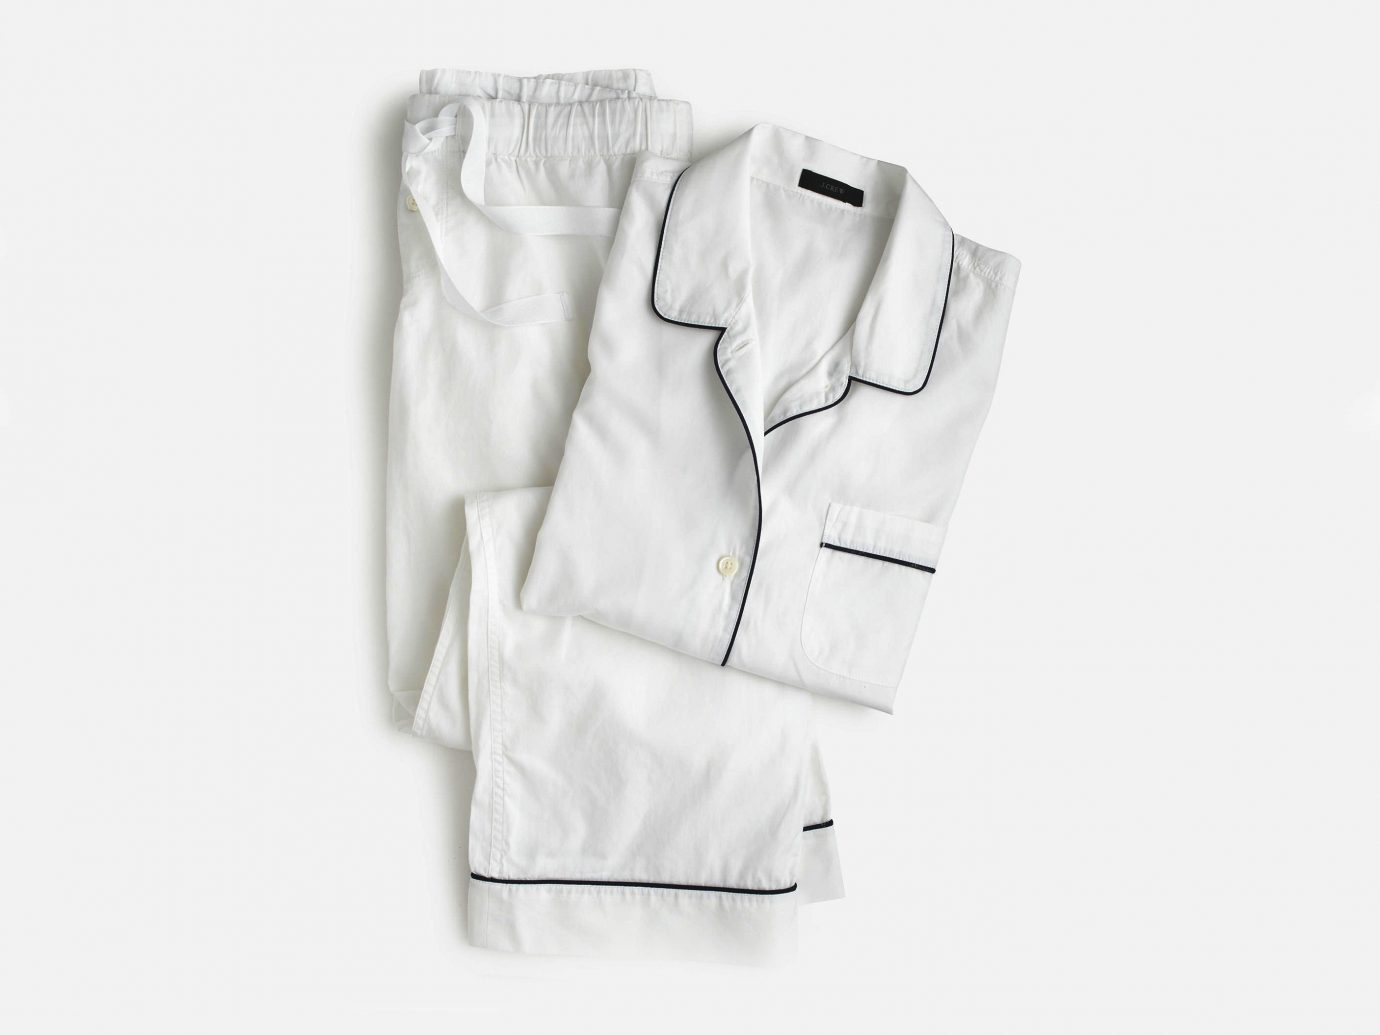 Health + Wellness Travel Tips clothing white sleeve dress shirt pocket outerwear tuxedo formal wear leather textile jacket collar shirt suit